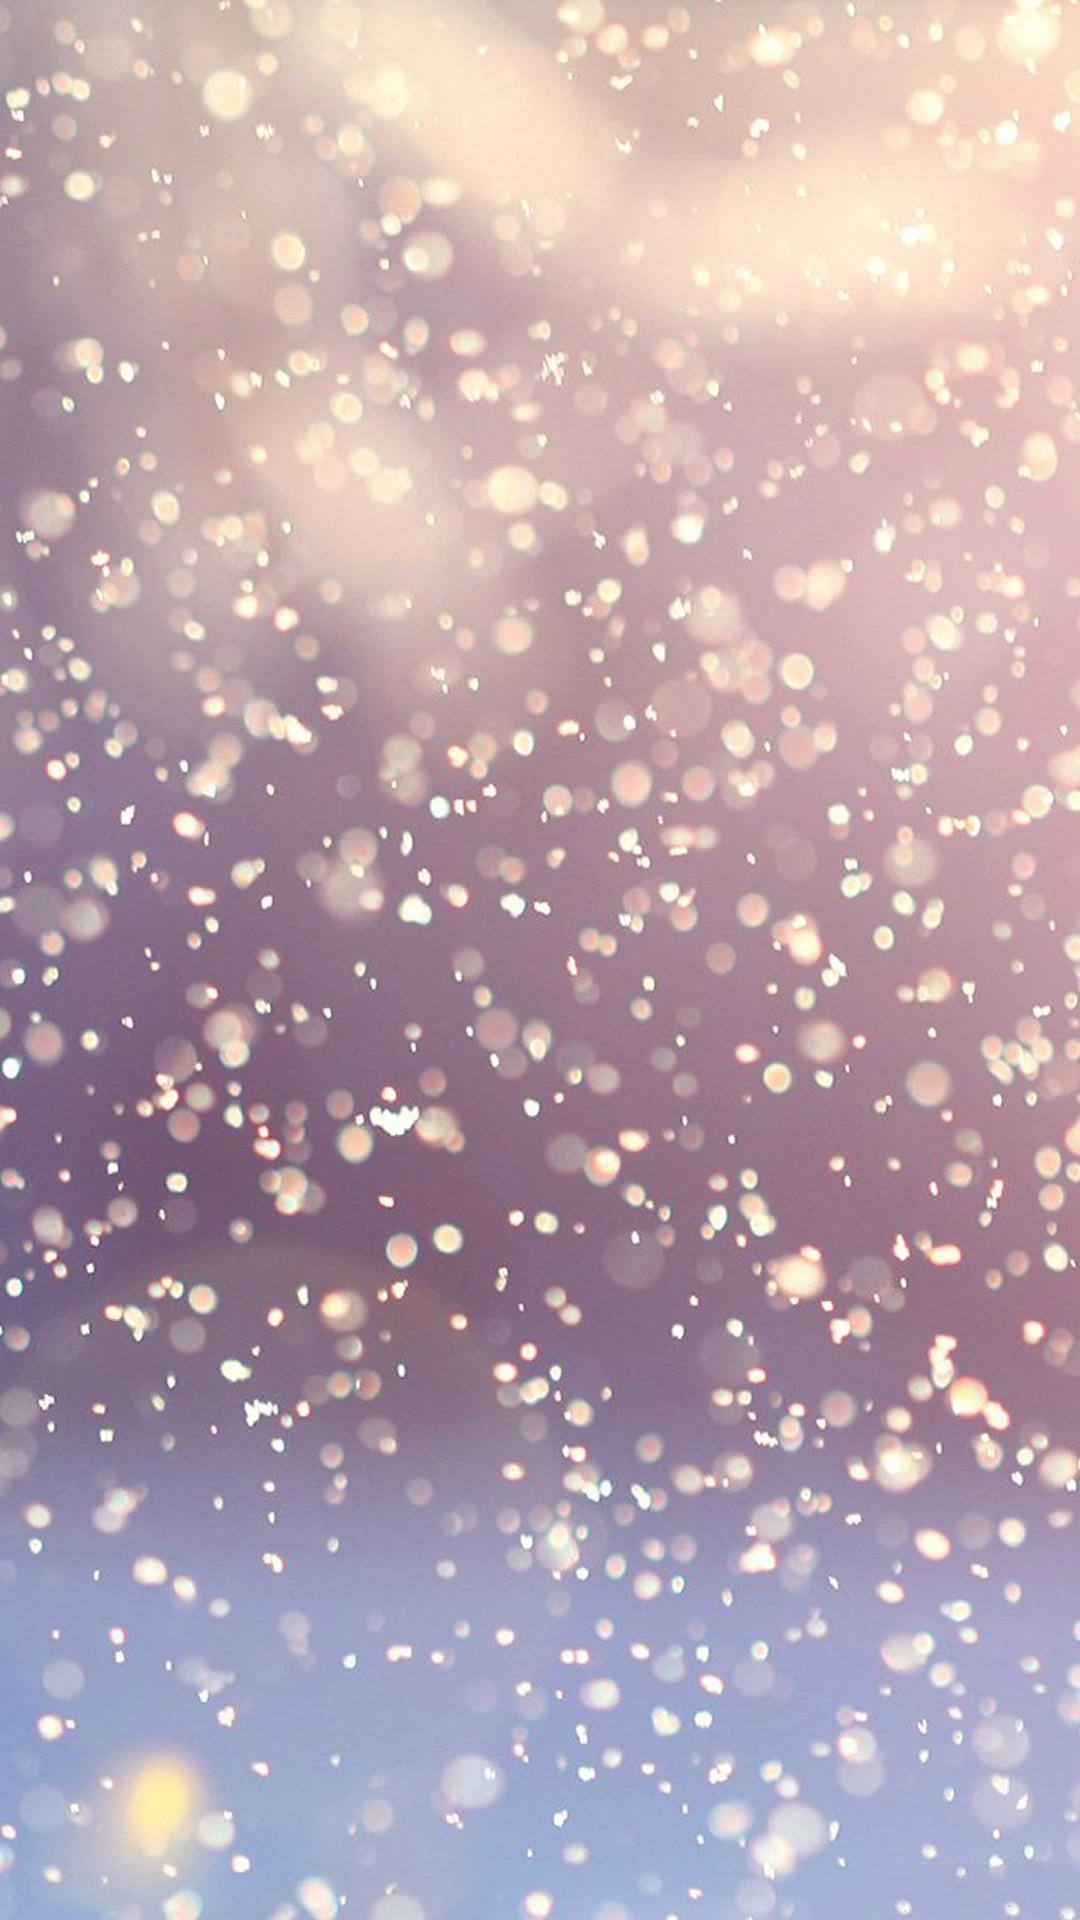 Bokeh Snow Flare Water Splash Pattern iPhone 6 wallpaper More